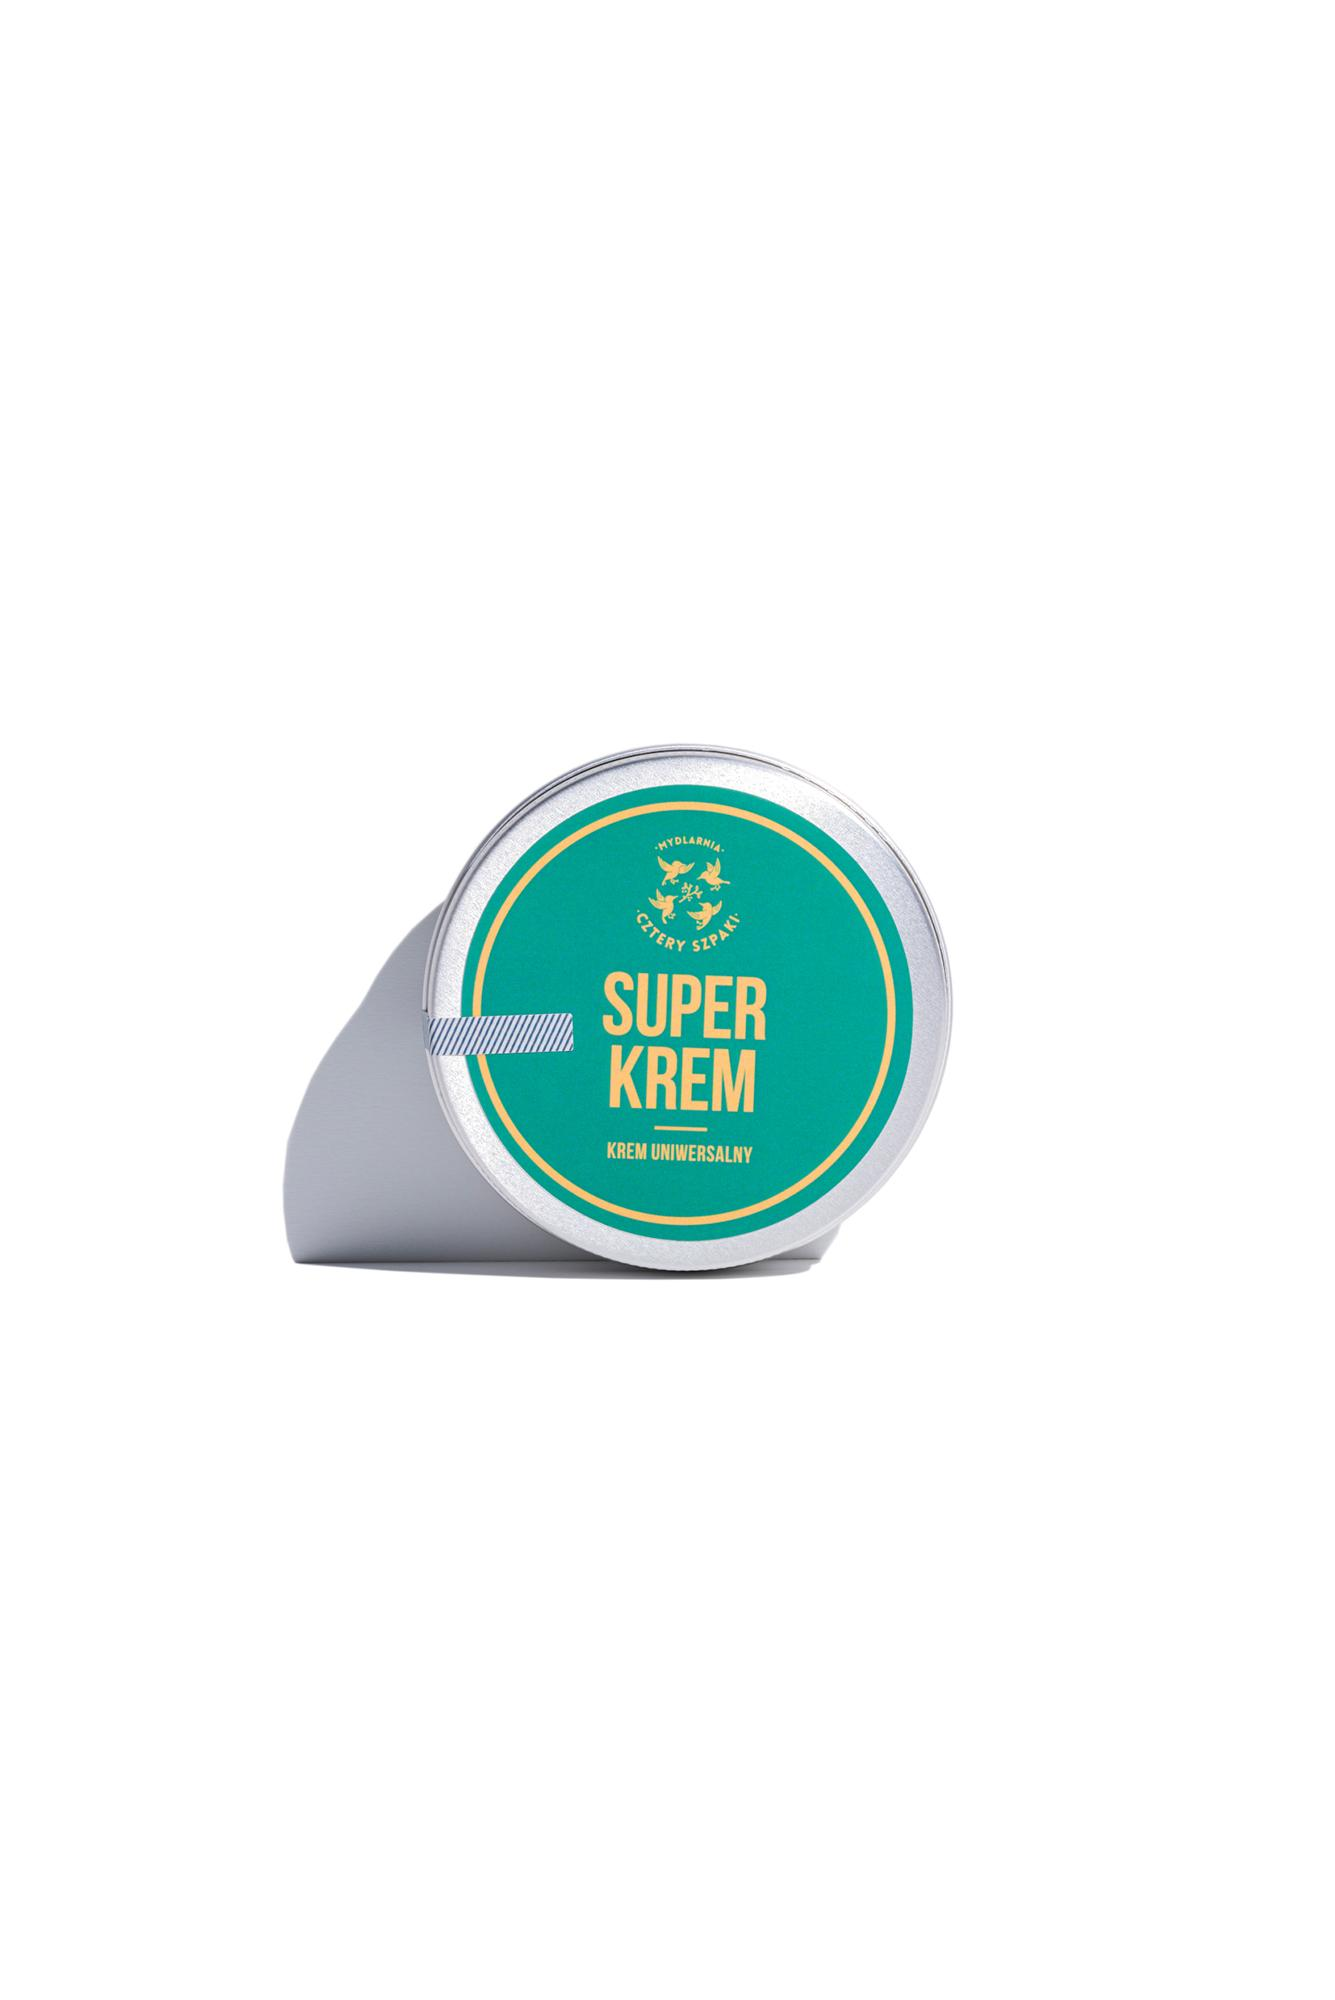 SUPER KREM